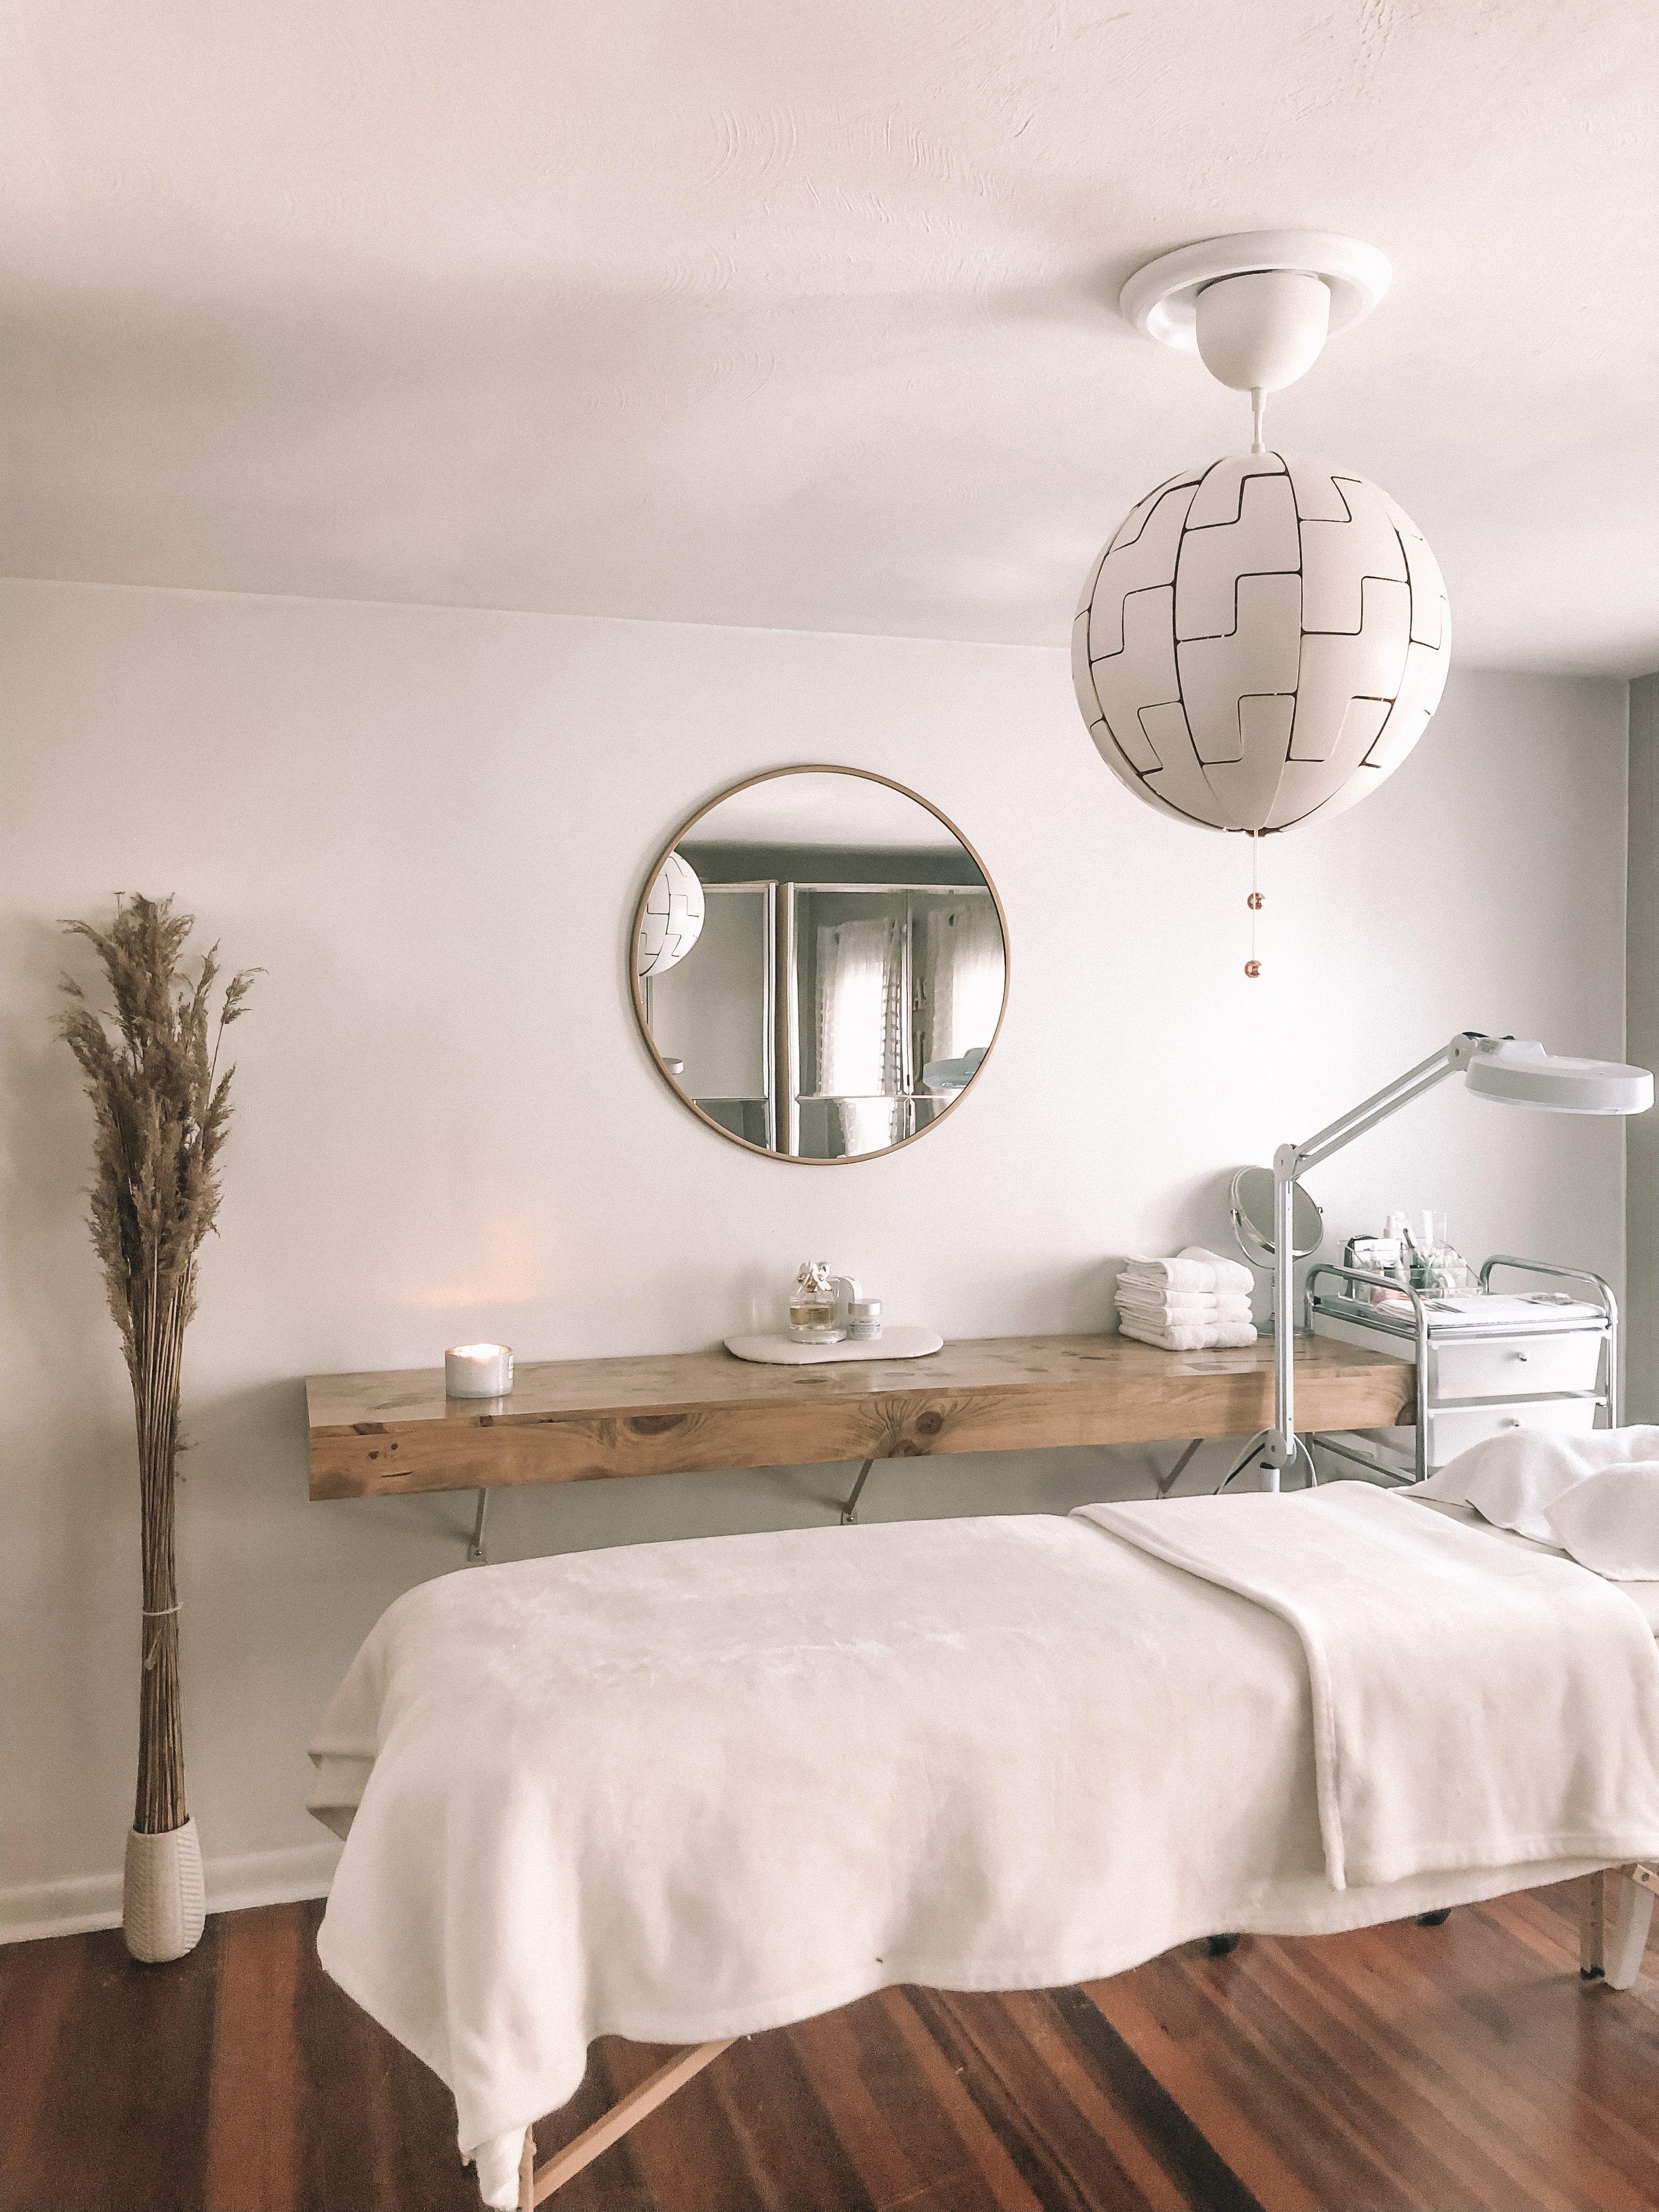 Lash Room #lashroomdecor Eyelash extension lash decor. Clean, minimalistic, rus... #Treatme...